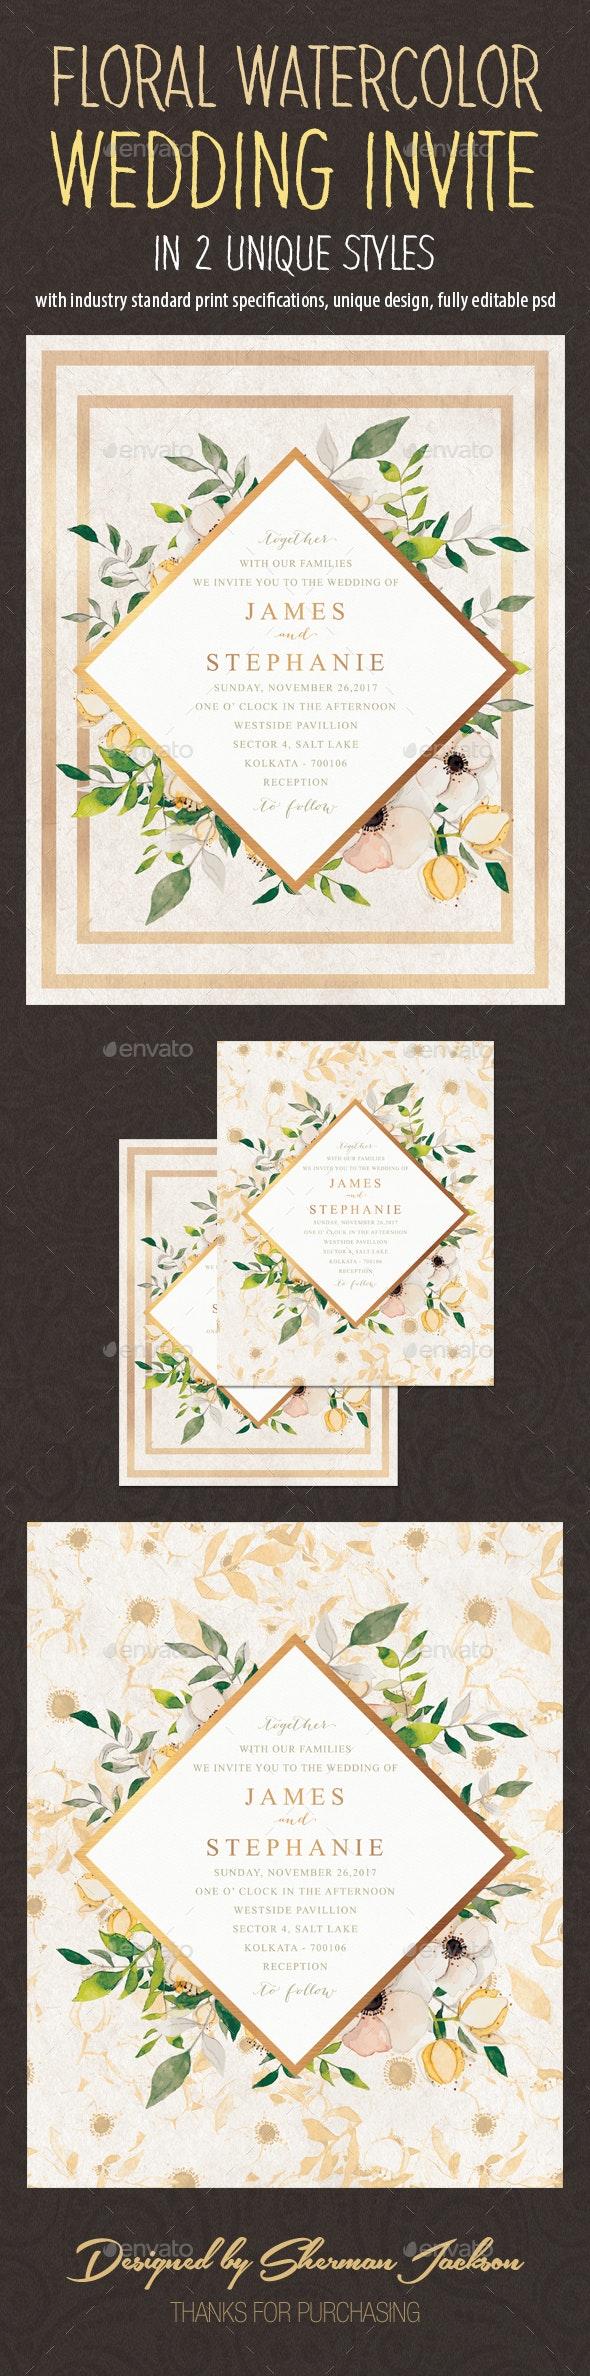 Floral Watercolor Wedding Invitation Card - Invitations Cards & Invites